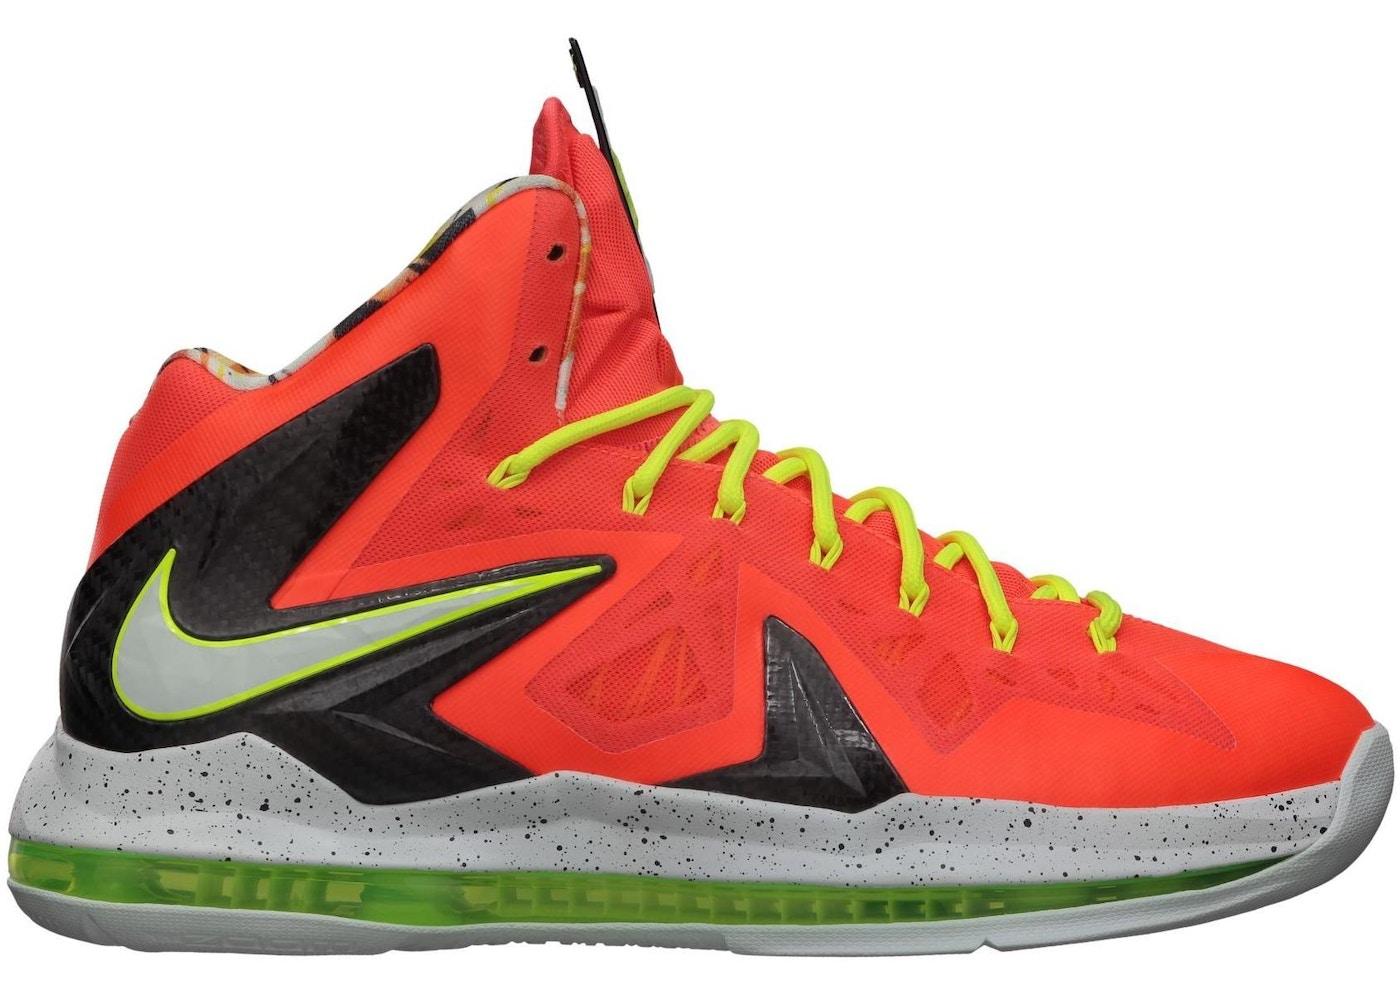 46e59c728162 Buy Nike LeBron 10 Shoes   Deadstock Sneakers